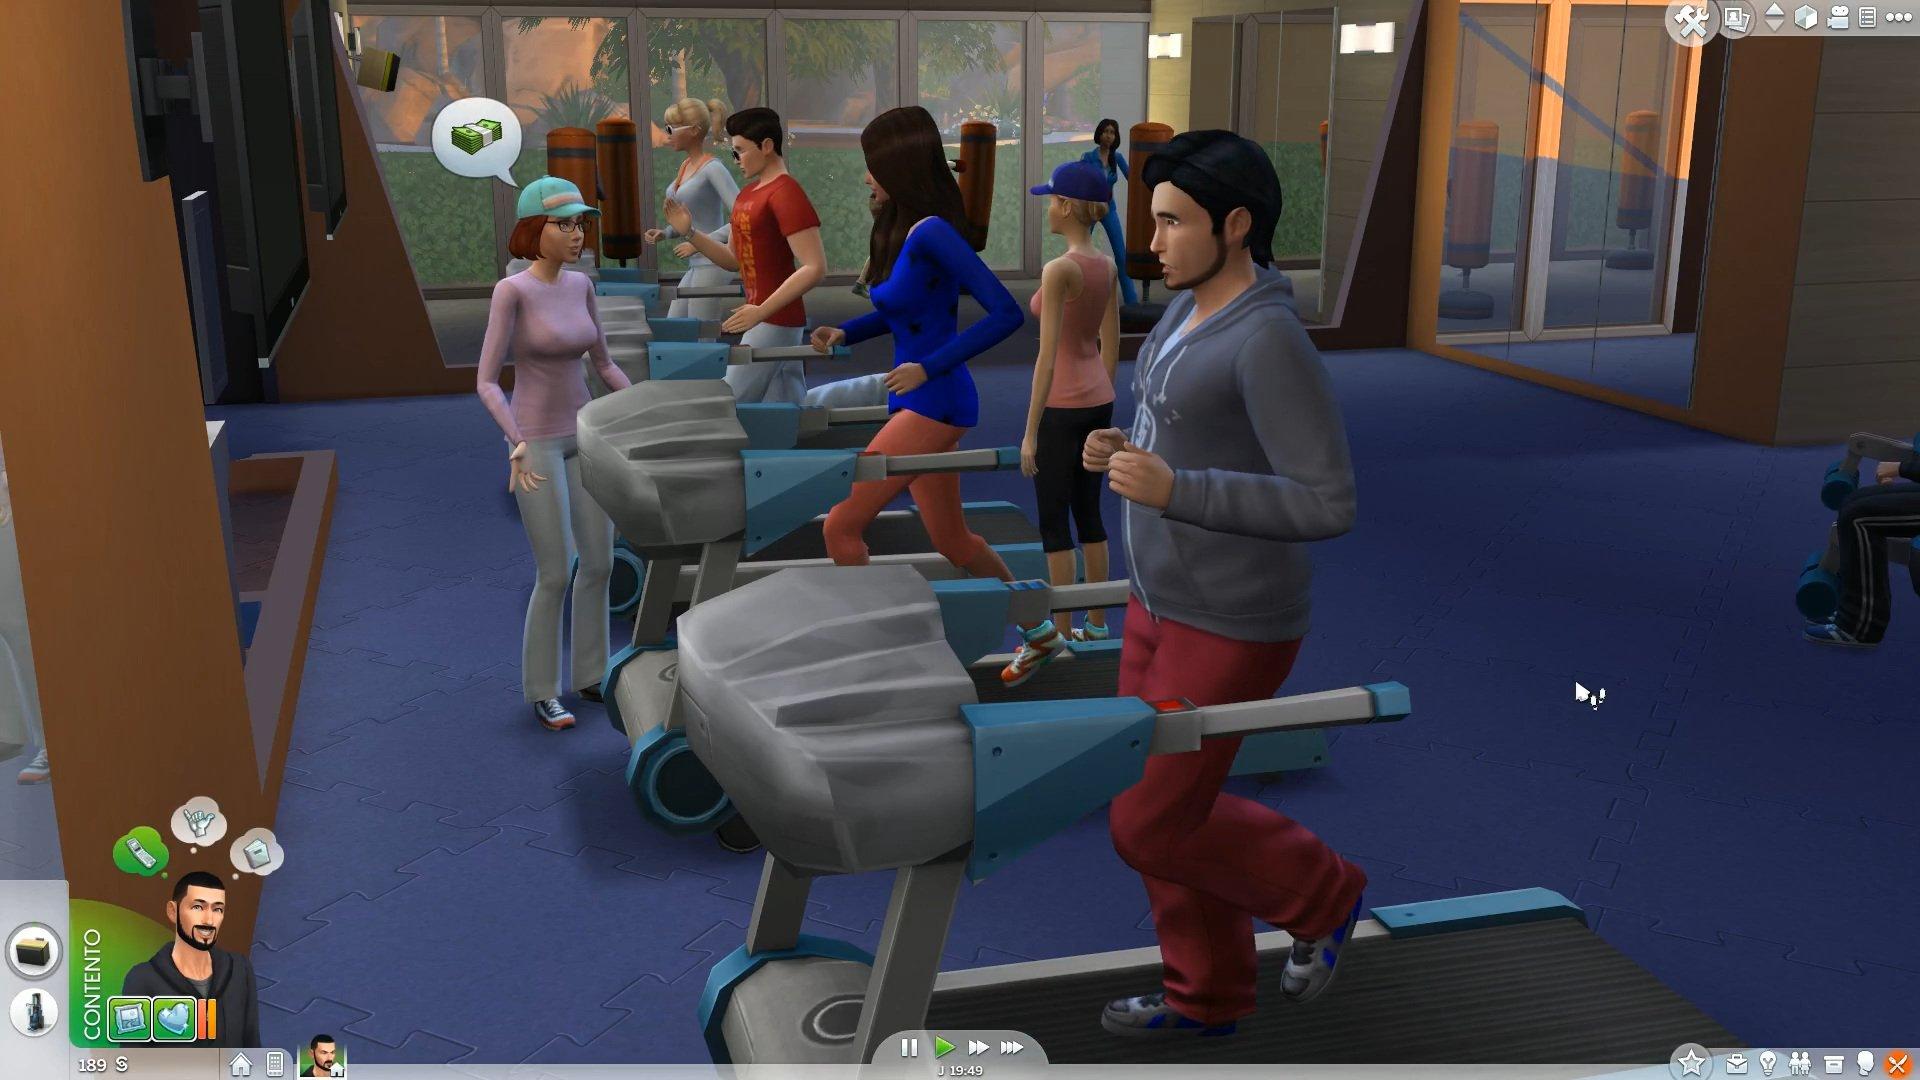 how to kill a sim in sims 4 mac